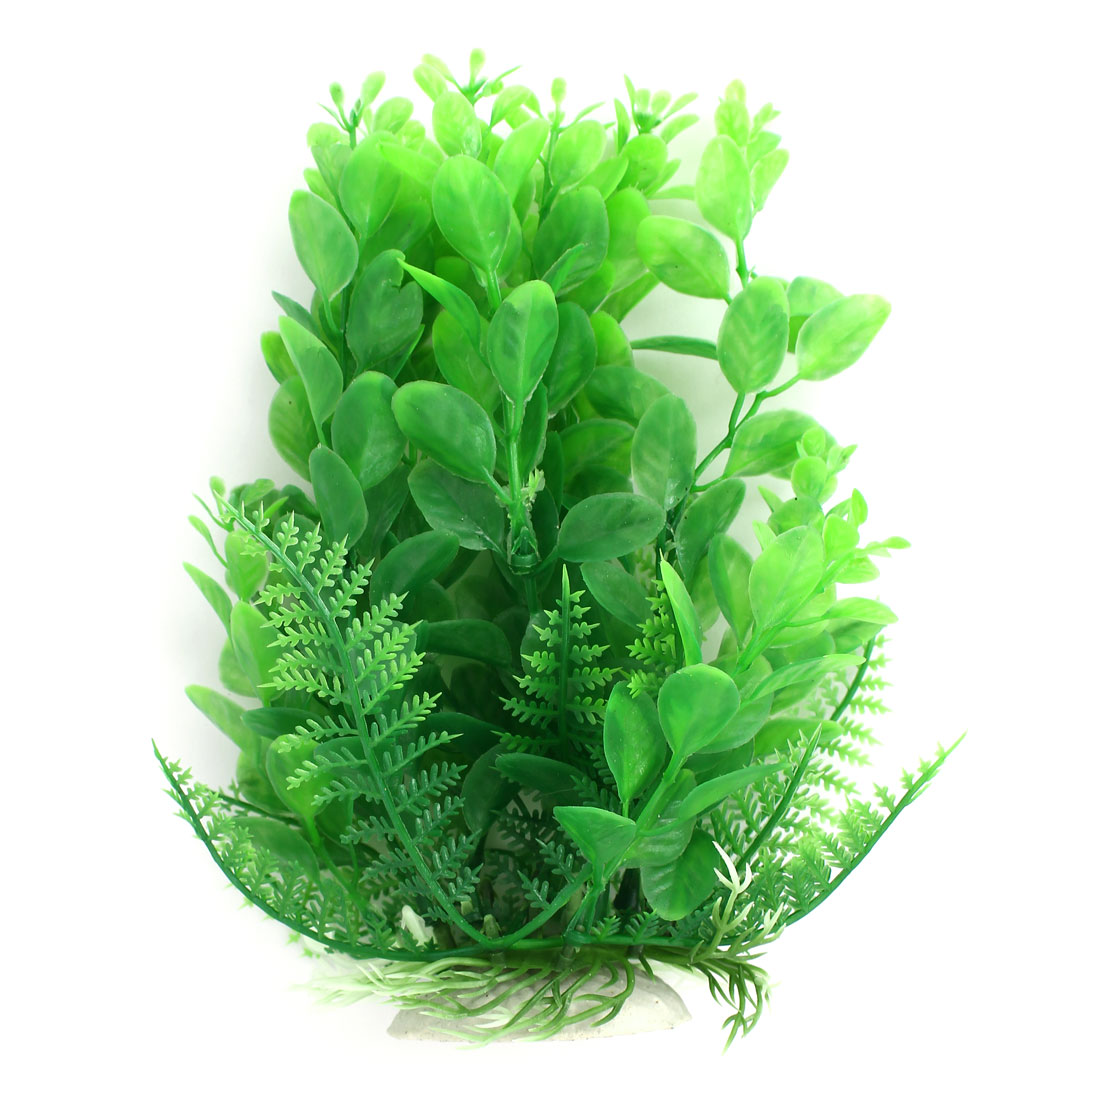 Aquarium Fish Tank Plastic Simulated Artificial Plant Grass Decor Ornament Green